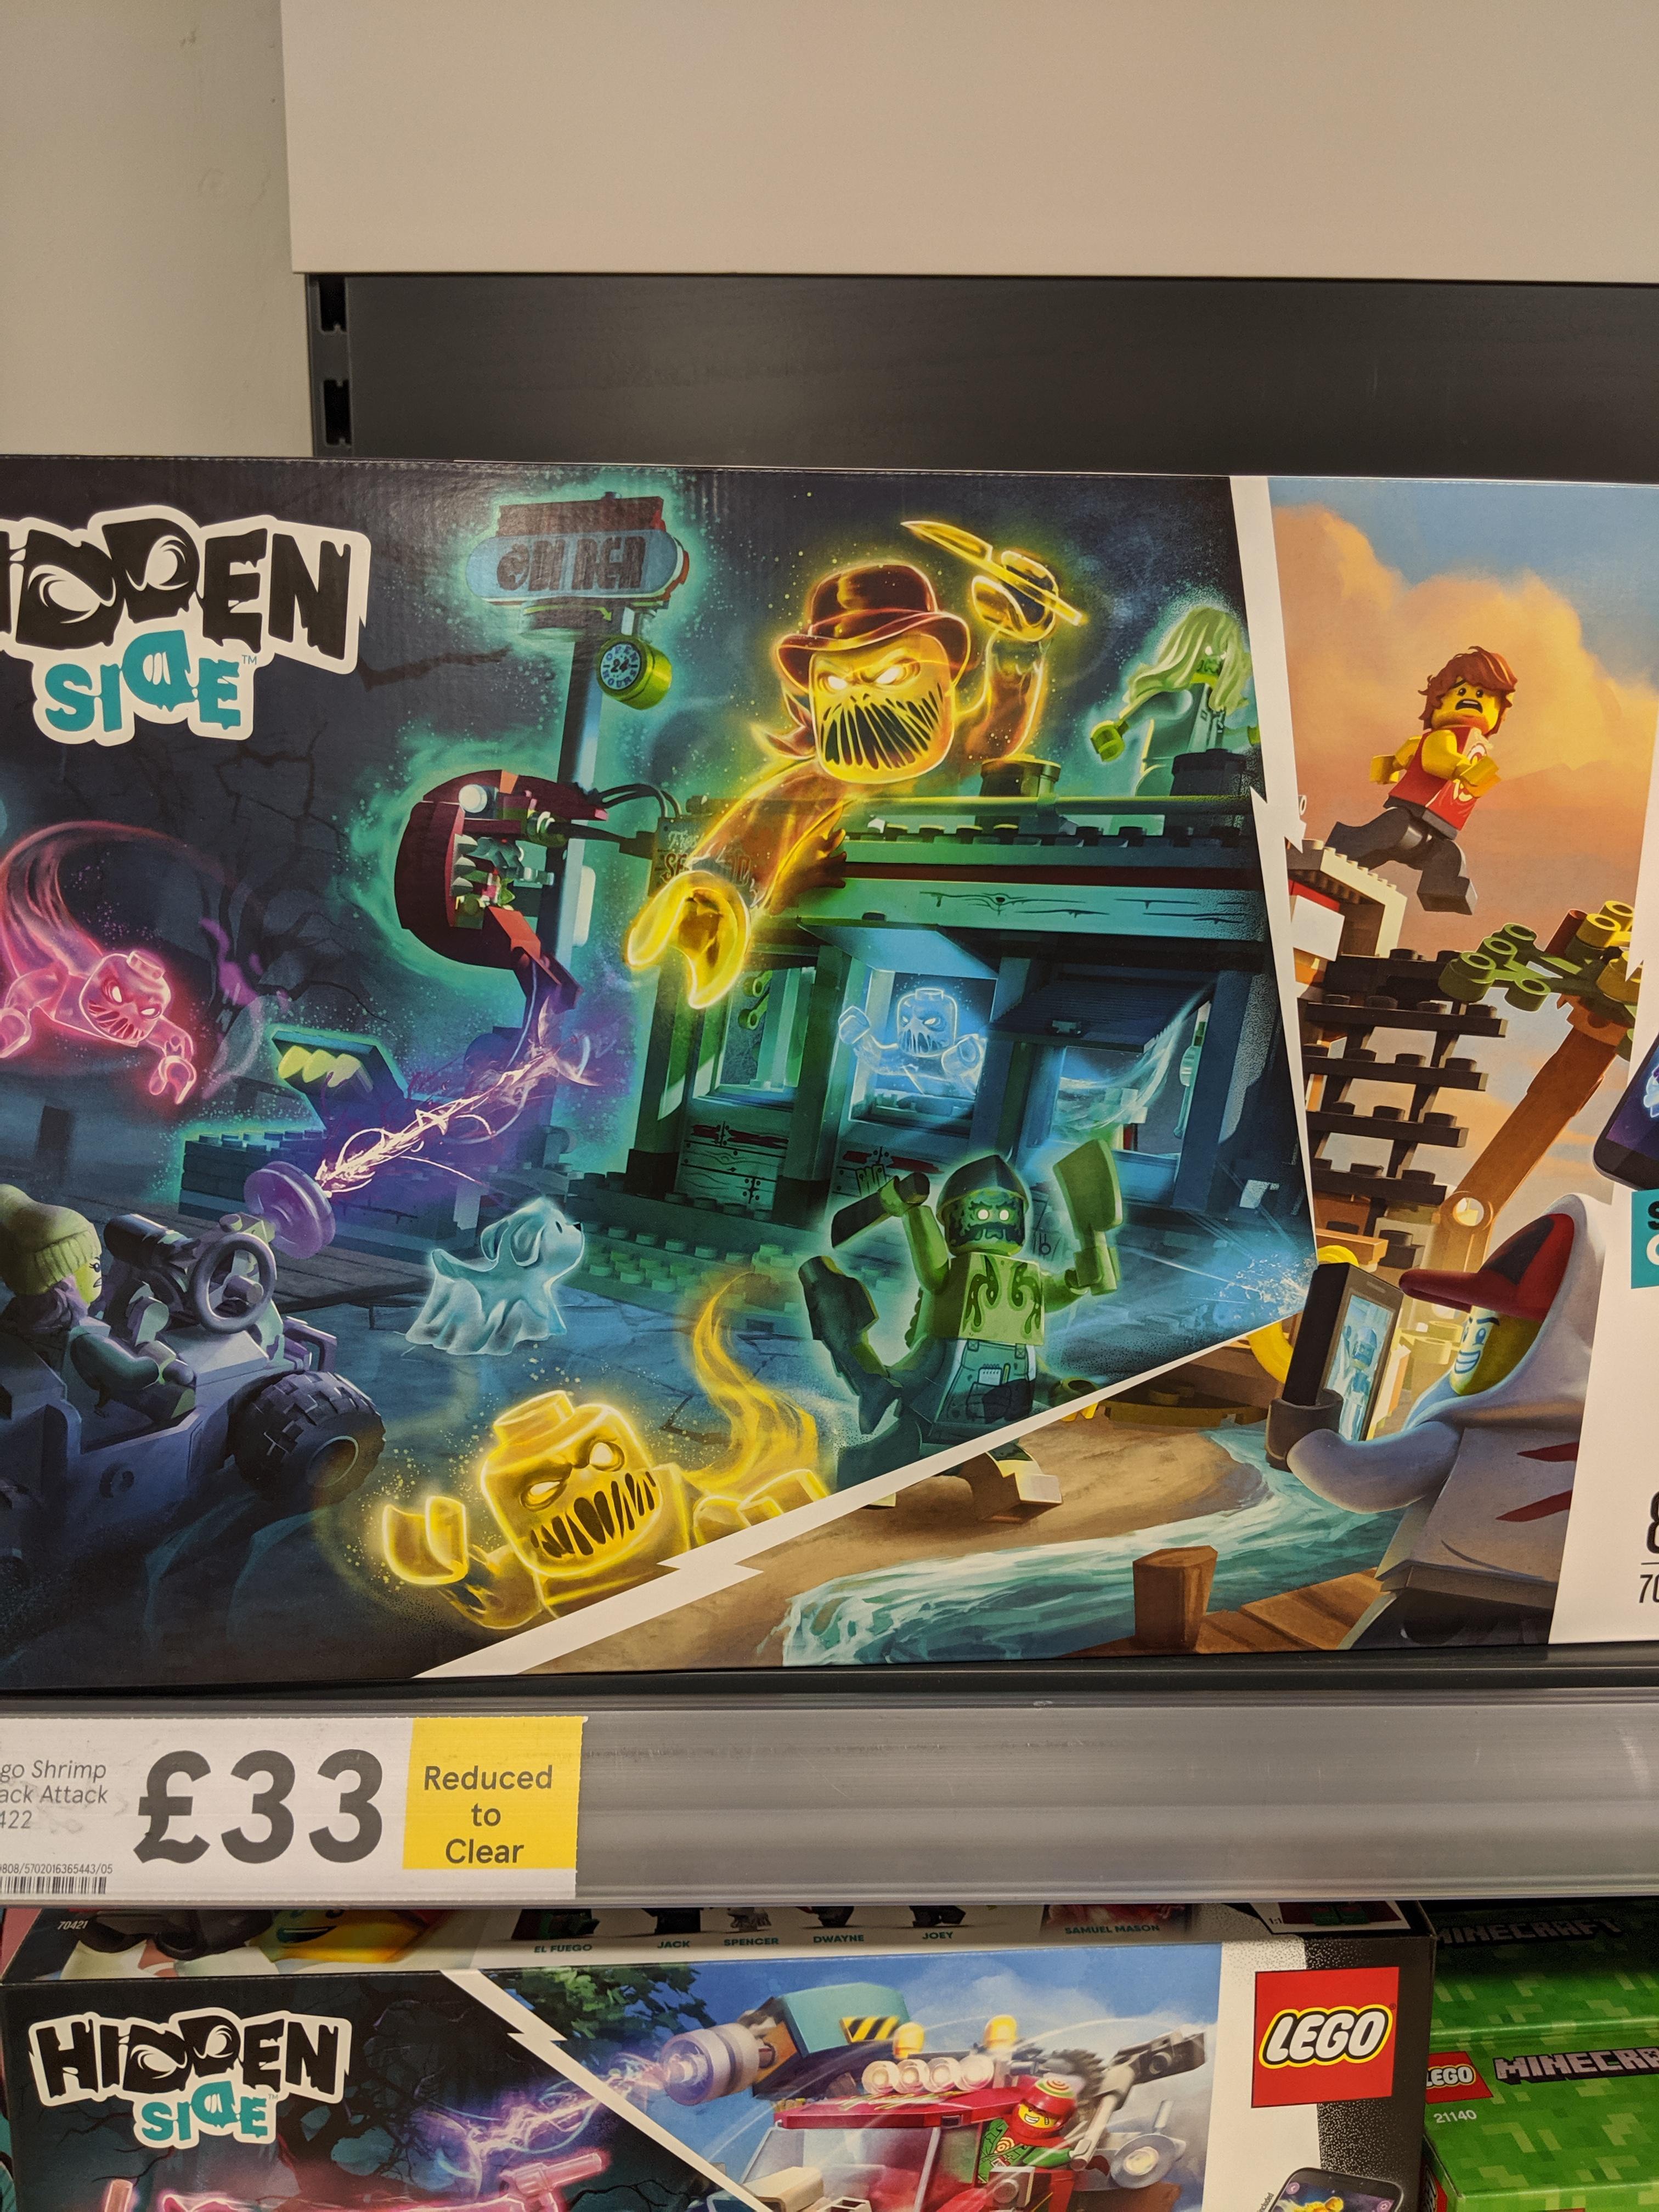 Lego Hidden Side 70422 Shrimp Shack Attack £33 @ Tesco instore